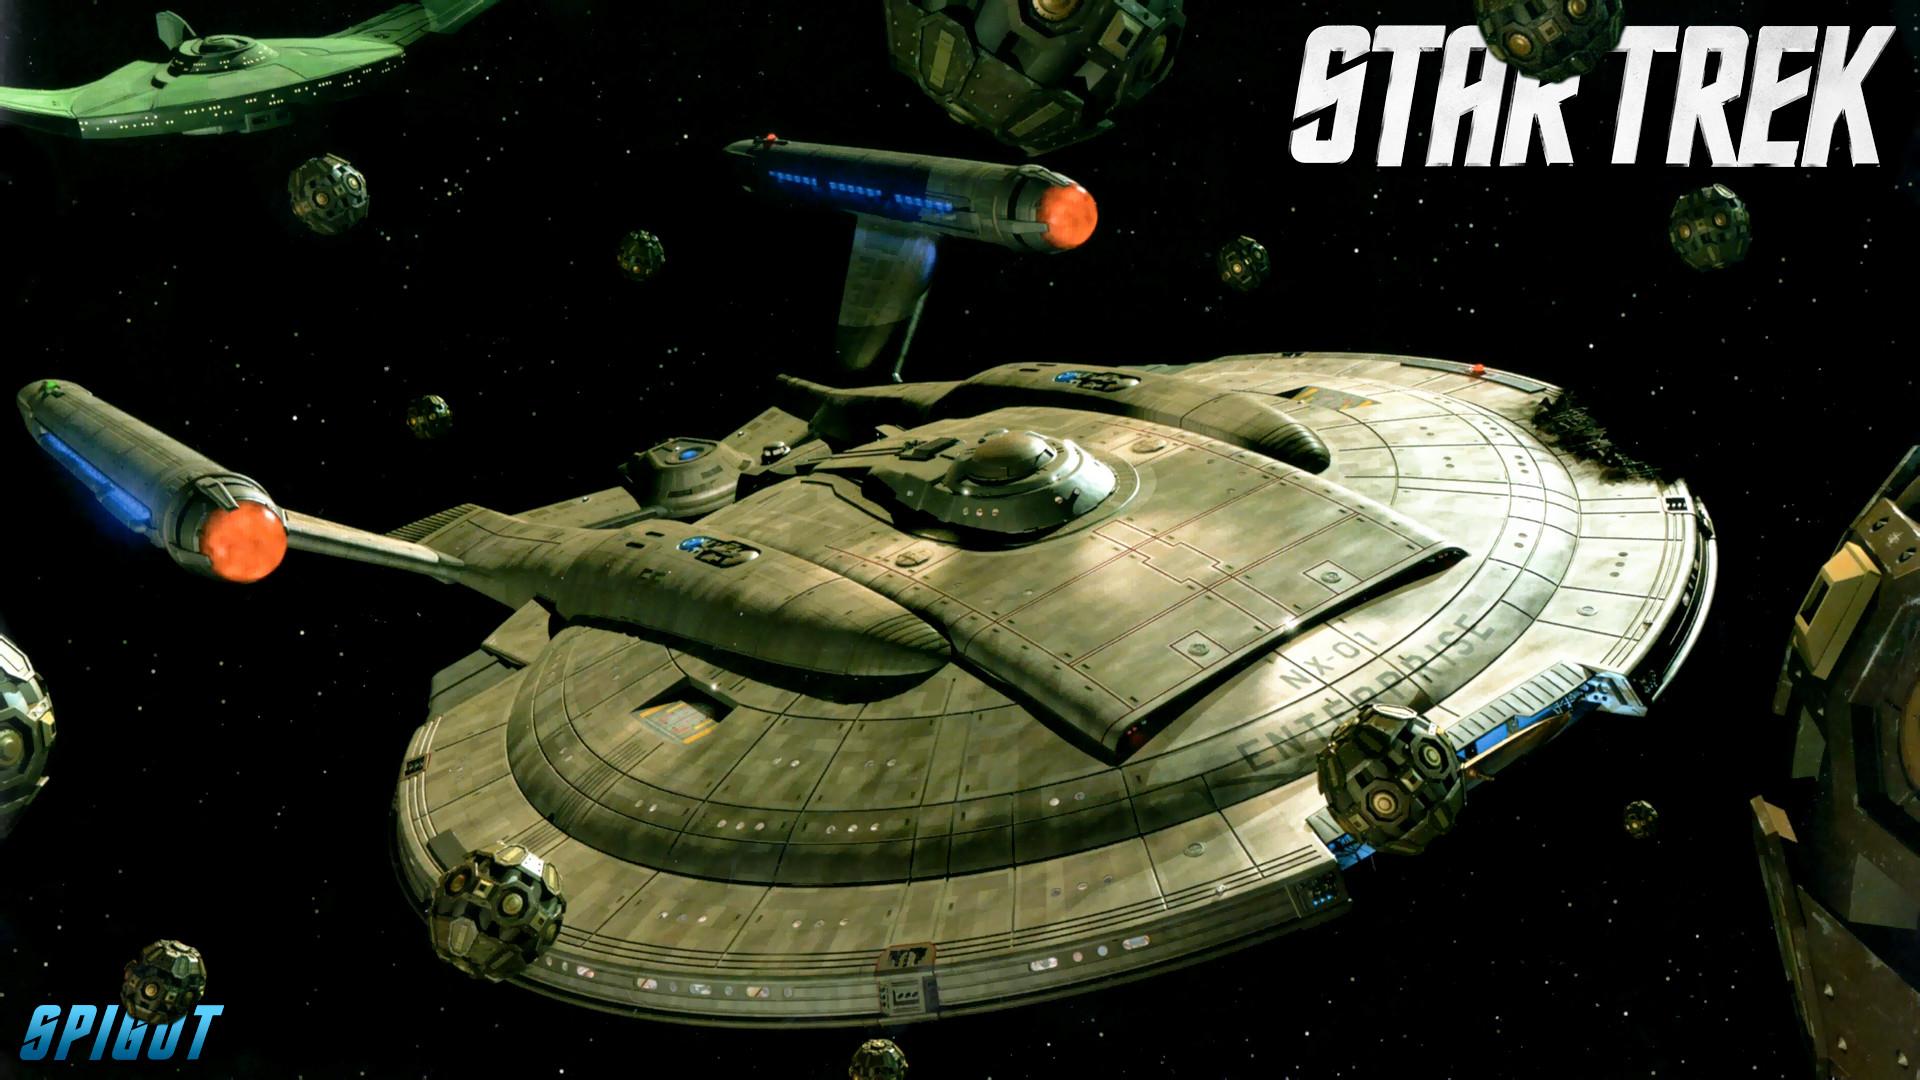 Star+Trek+Ships The Official Star Trek Star ships Die Cast Collection